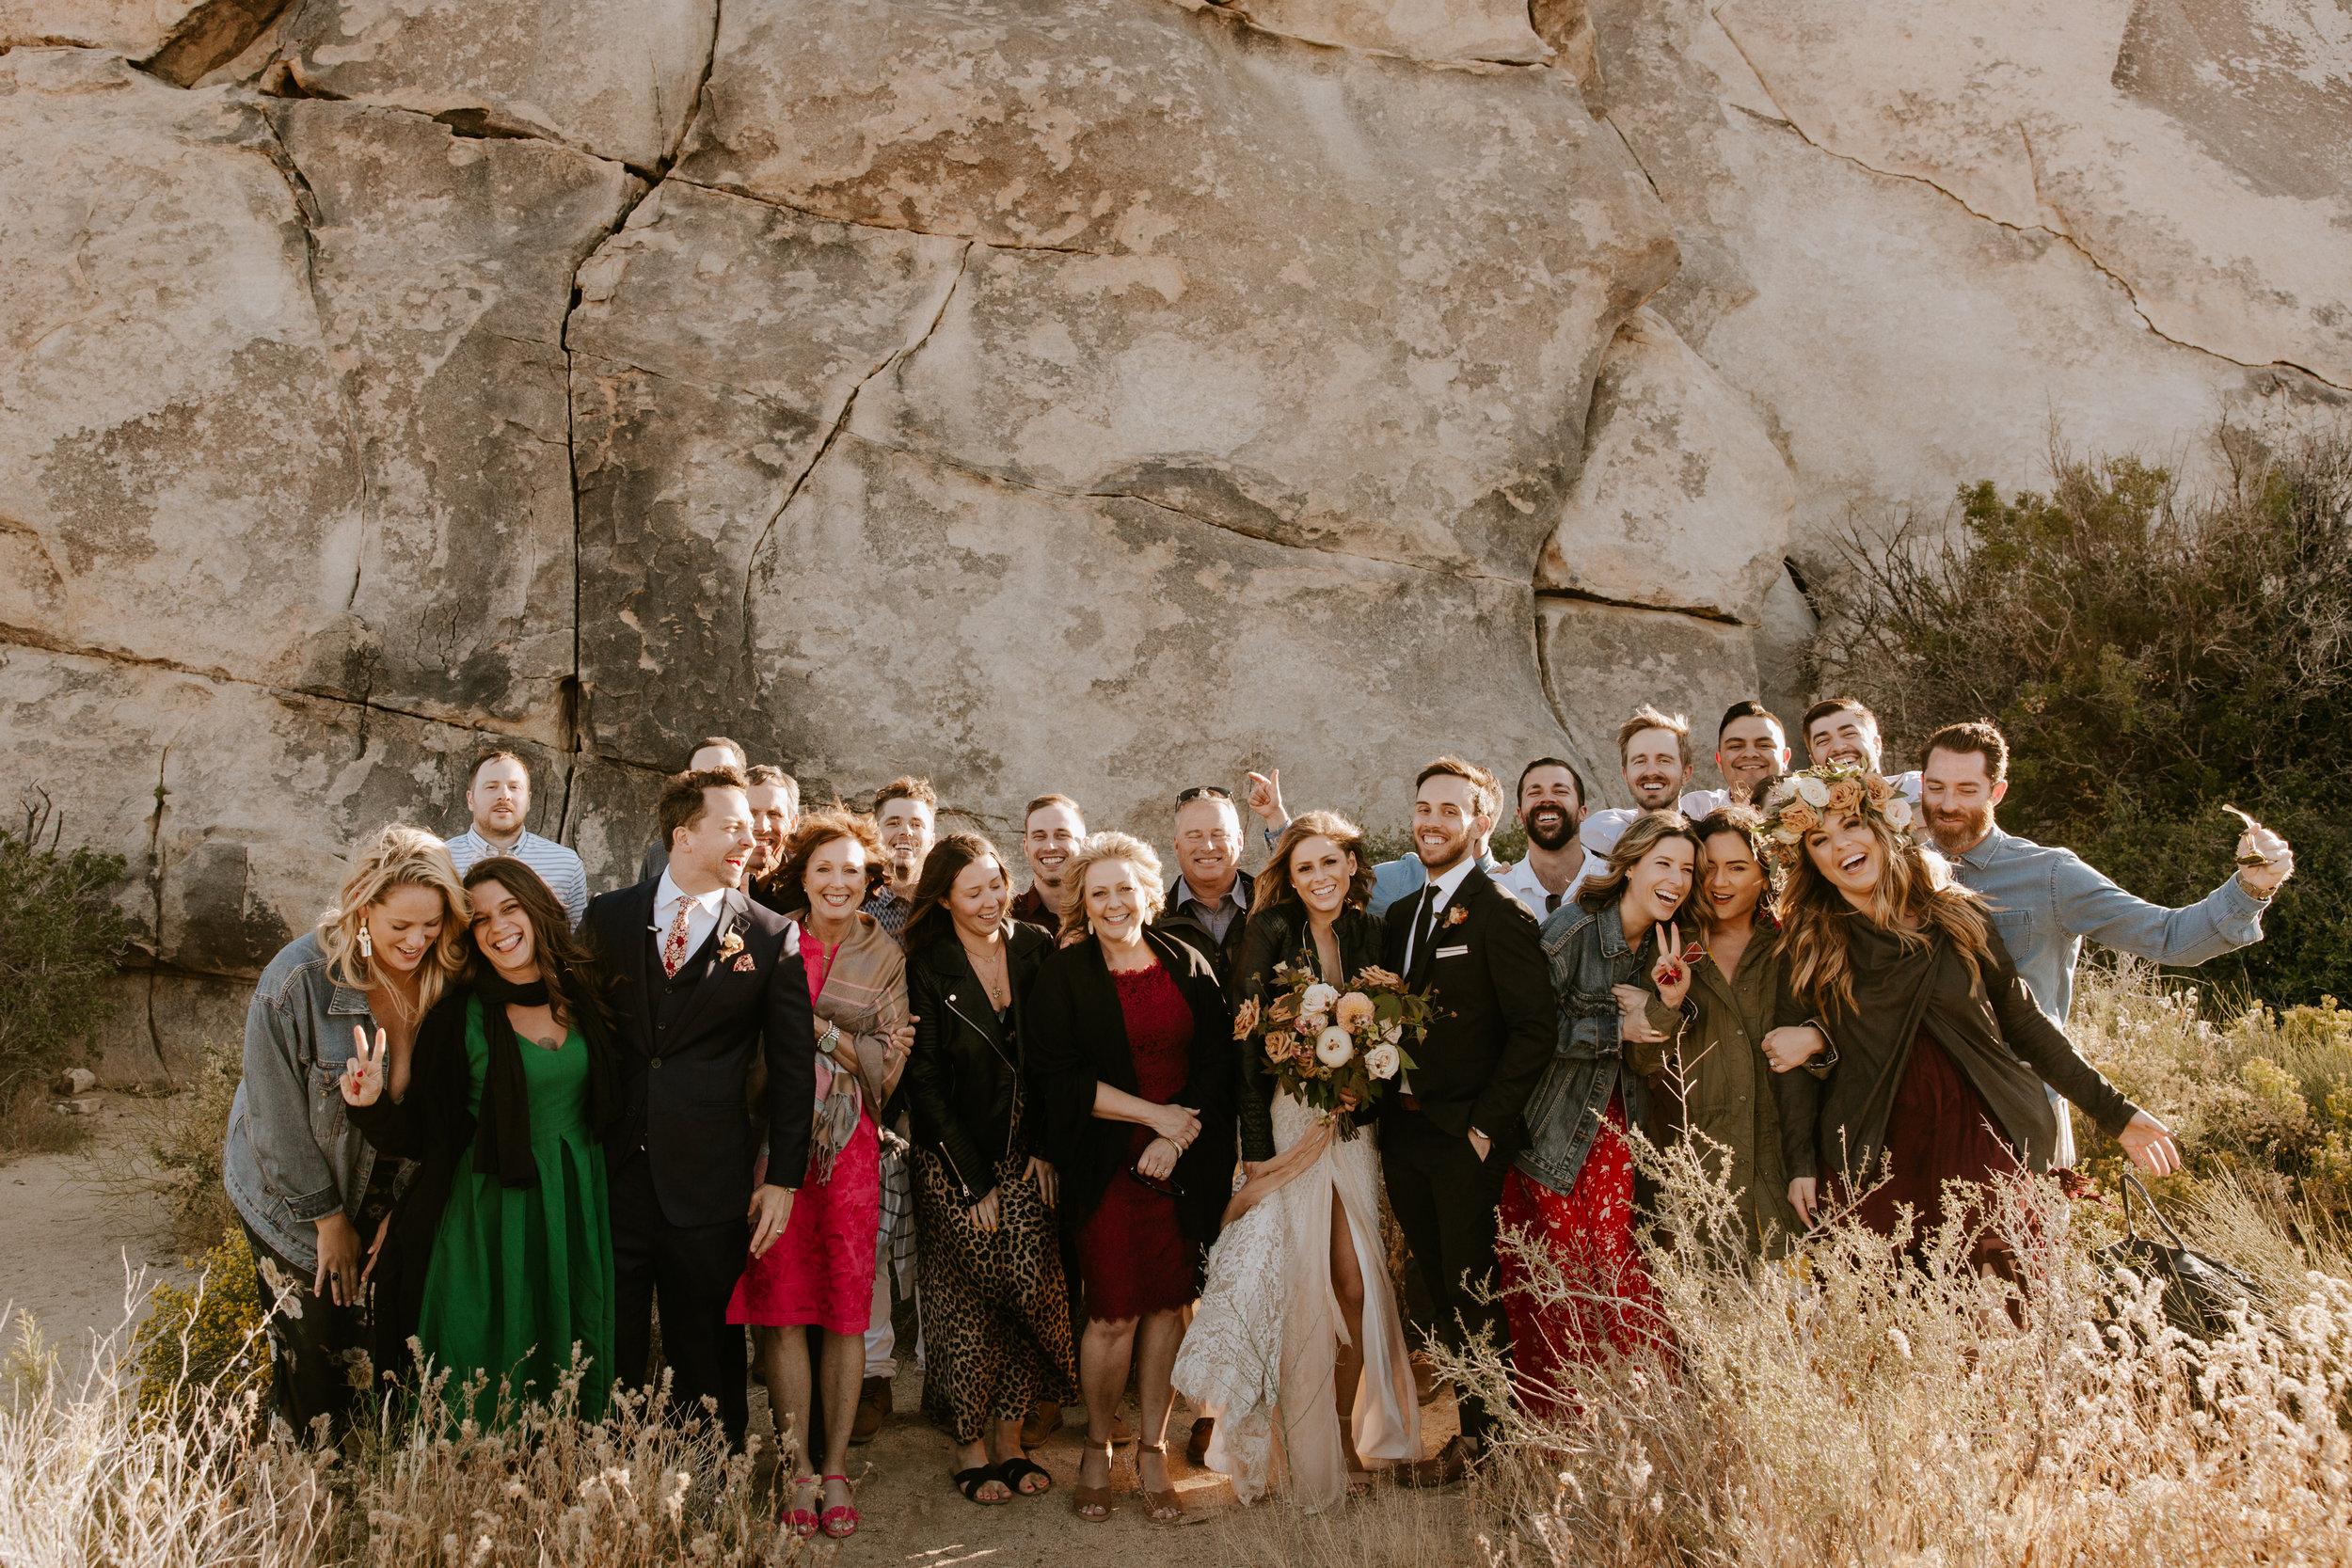 2019-05-26_Callie-Evan_Wedding_Joshua Tree_Paige Nelson_PREVIEWS HR-50.jpg